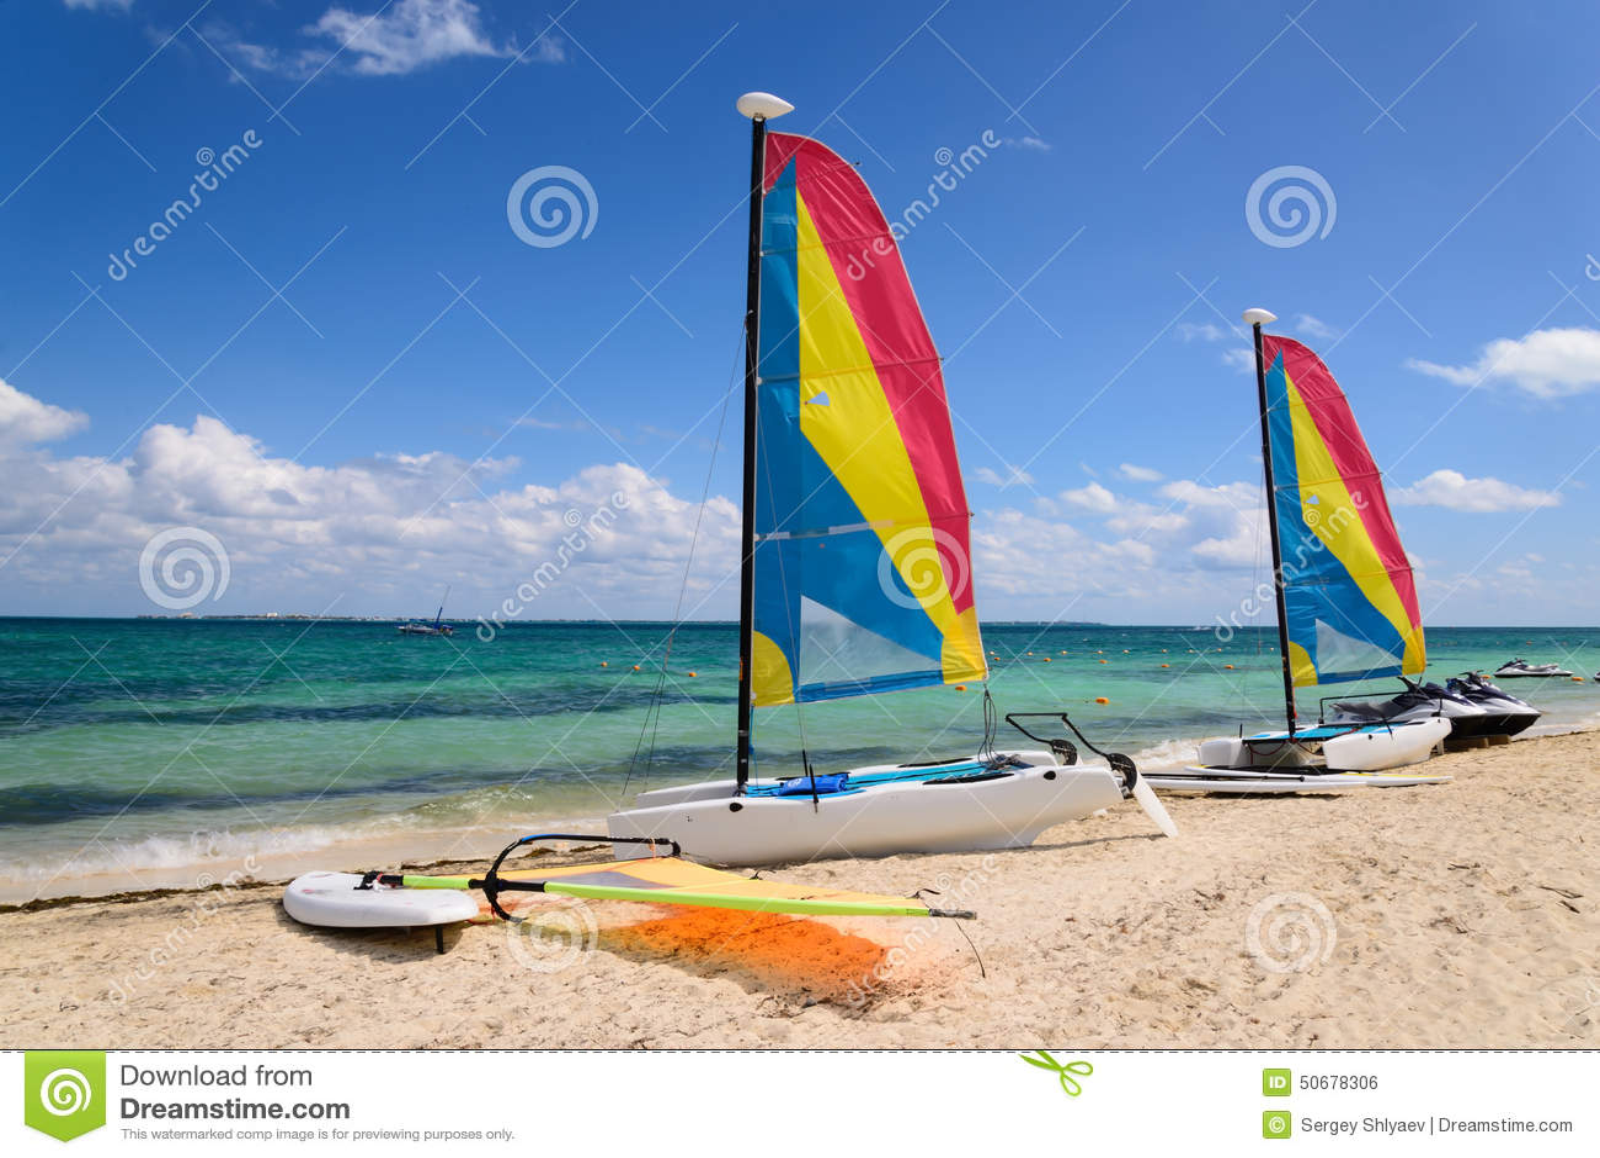 Download 在海岸的帆船 库存照片. 图片 包括有 五颜六色, 目的地, 手段, 沙子, 吸引力, 海岸, 夏天, 绿色 - 50678306